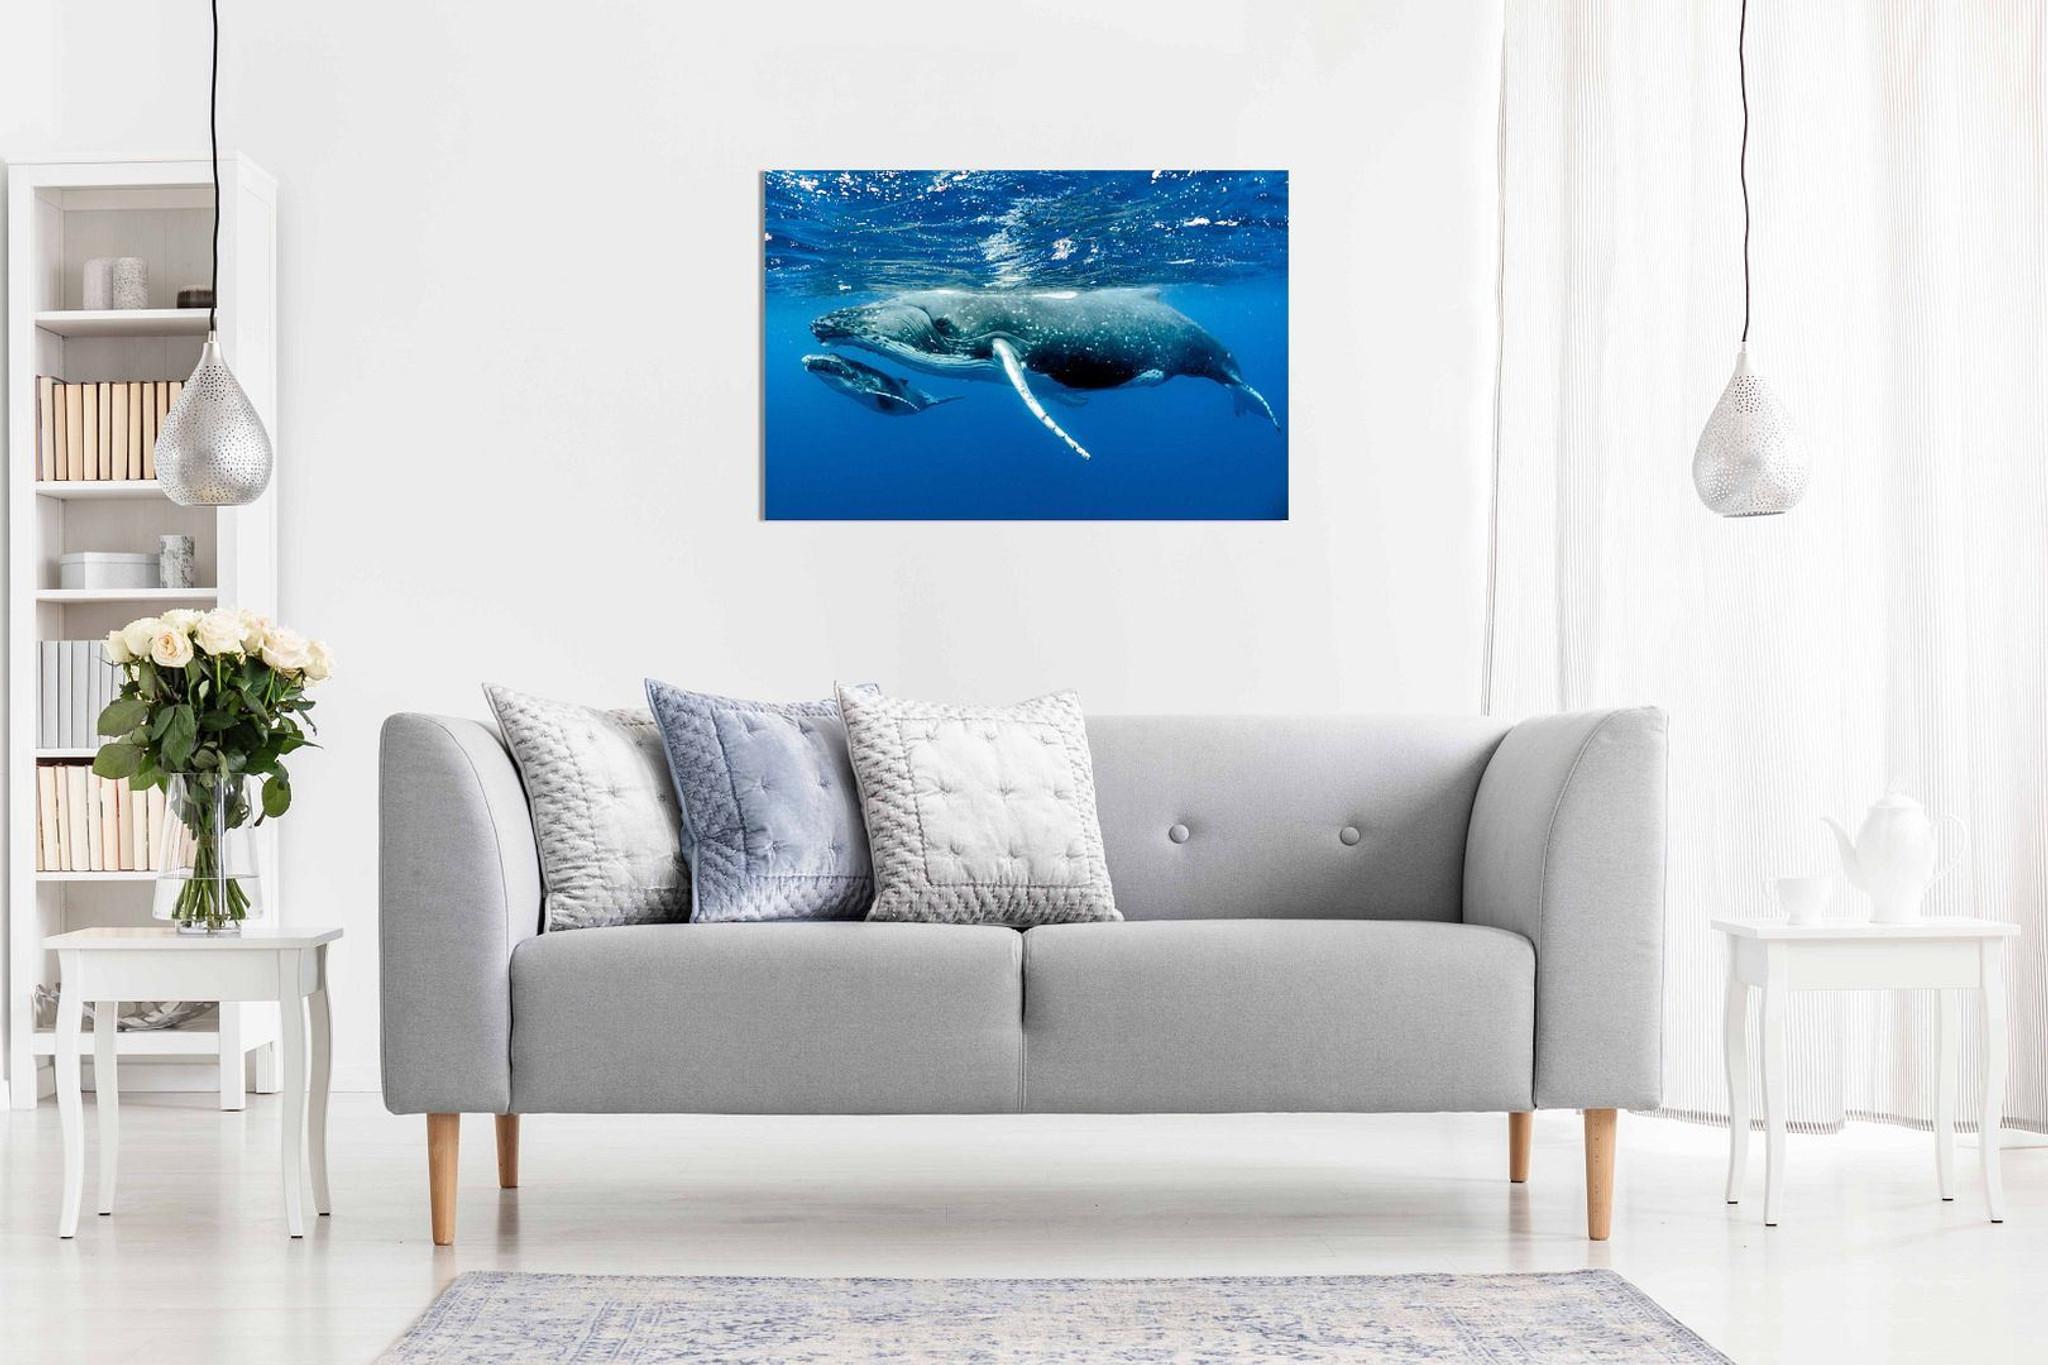 Humpback Whale Ocean SeaLife Sea Nature Canvas Wall Art Picture Print Home Decor